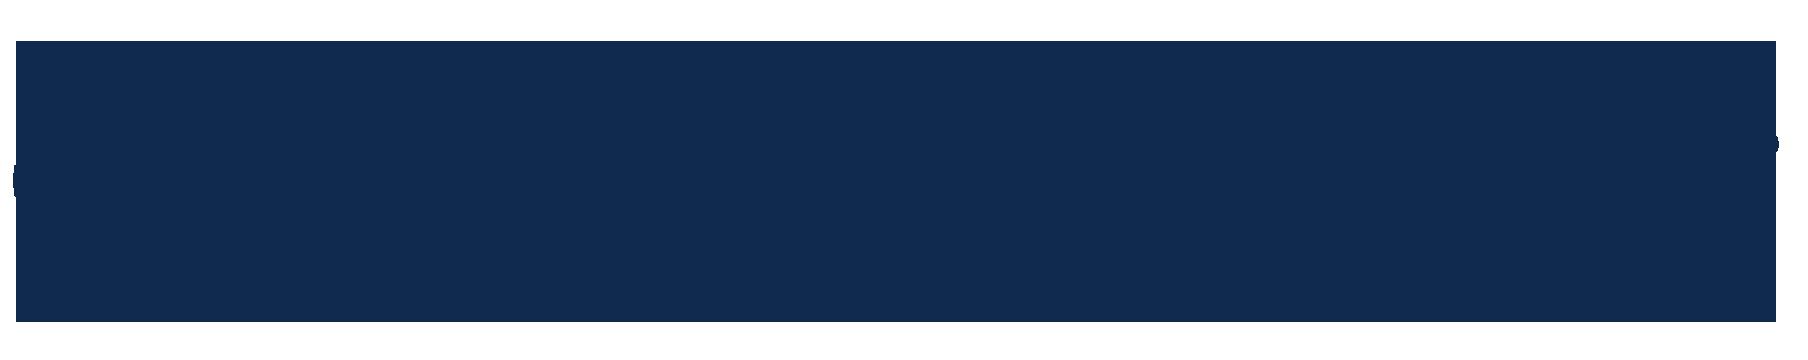 Fp Rewards Logo1